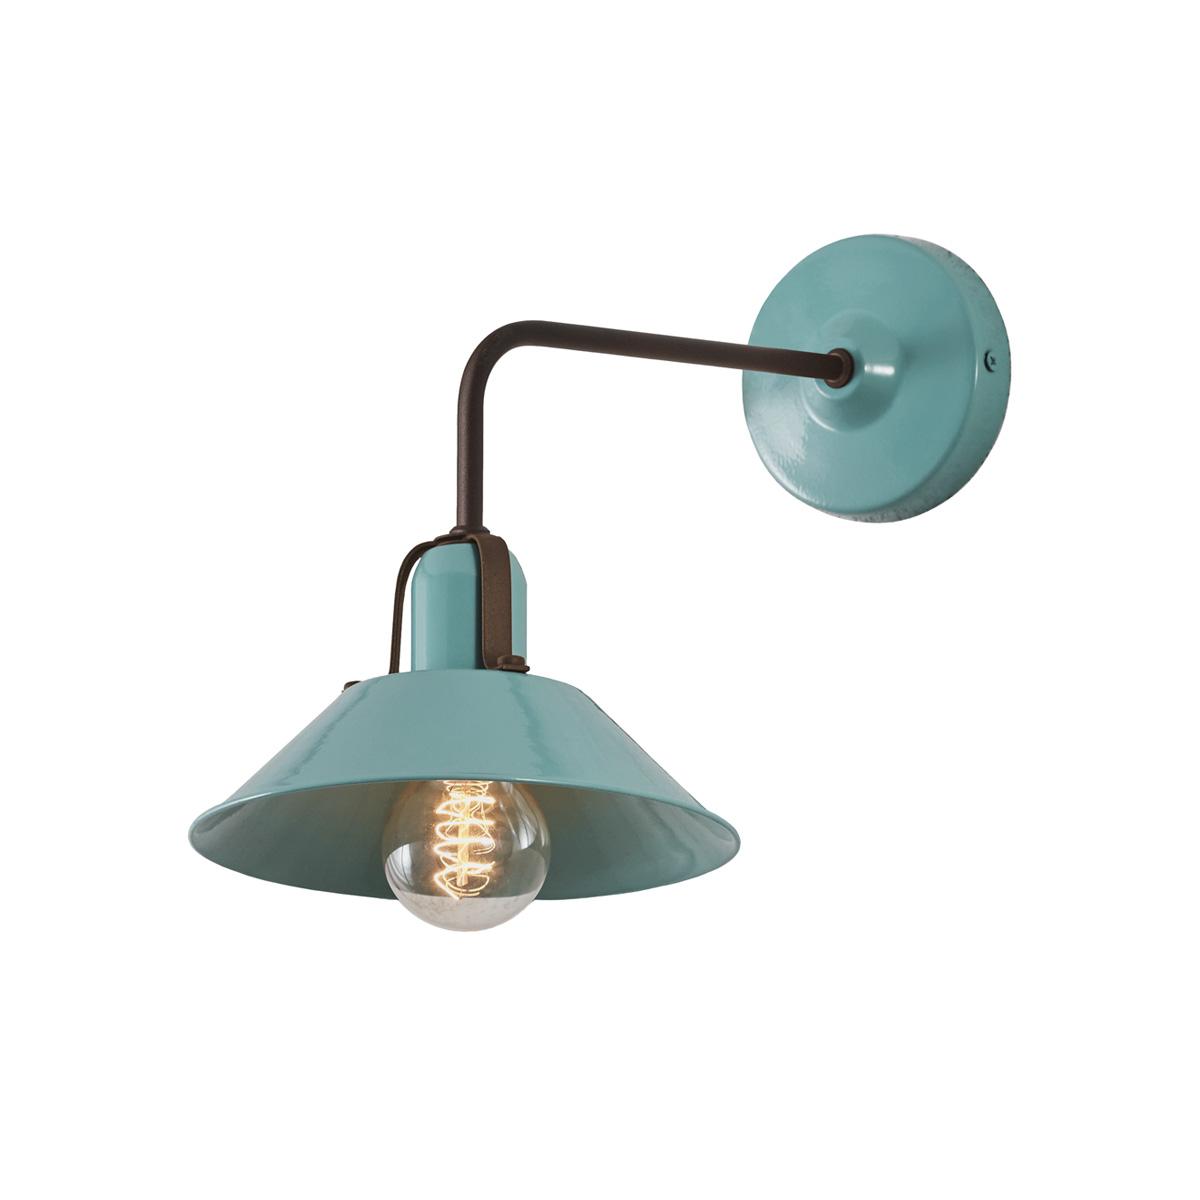 Vintage βεραμάν απλίκα ΜΗΛΟΣ vintage pastel turquoise wall lamp